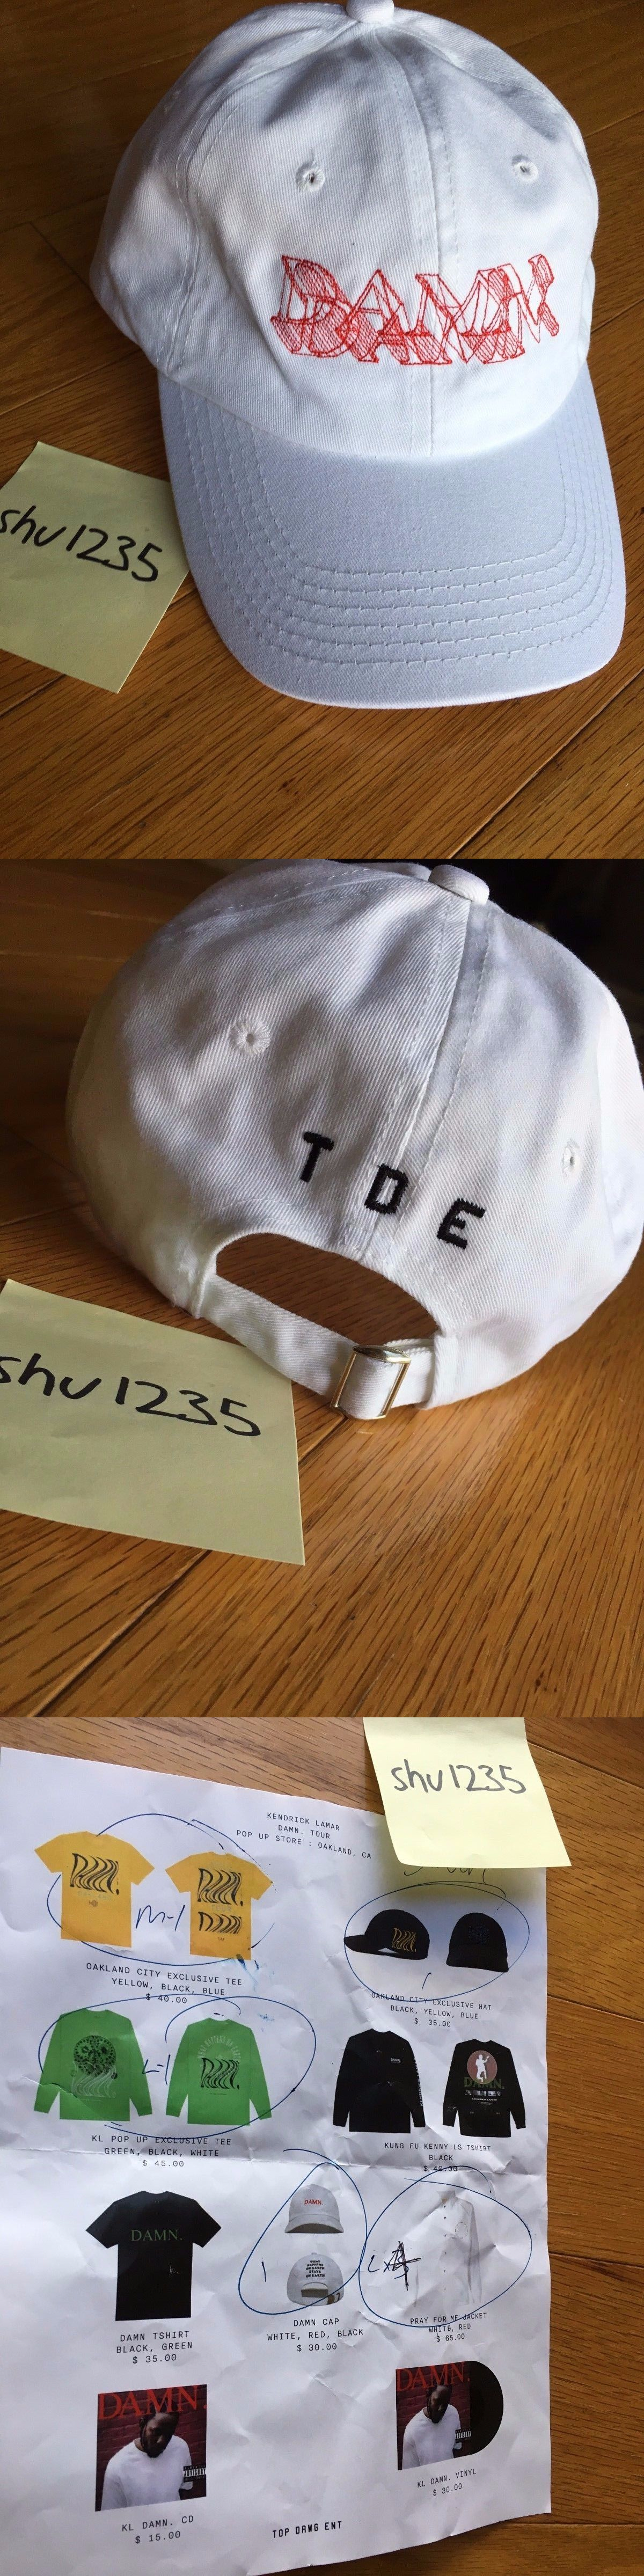 bca724b3faa Hats 163543  Kendrick Lamar Pop Up Exclusive White Red 3D Damn Tour Hat Dad  Cap Tde -  BUY IT NOW ONLY   85 on eBay!